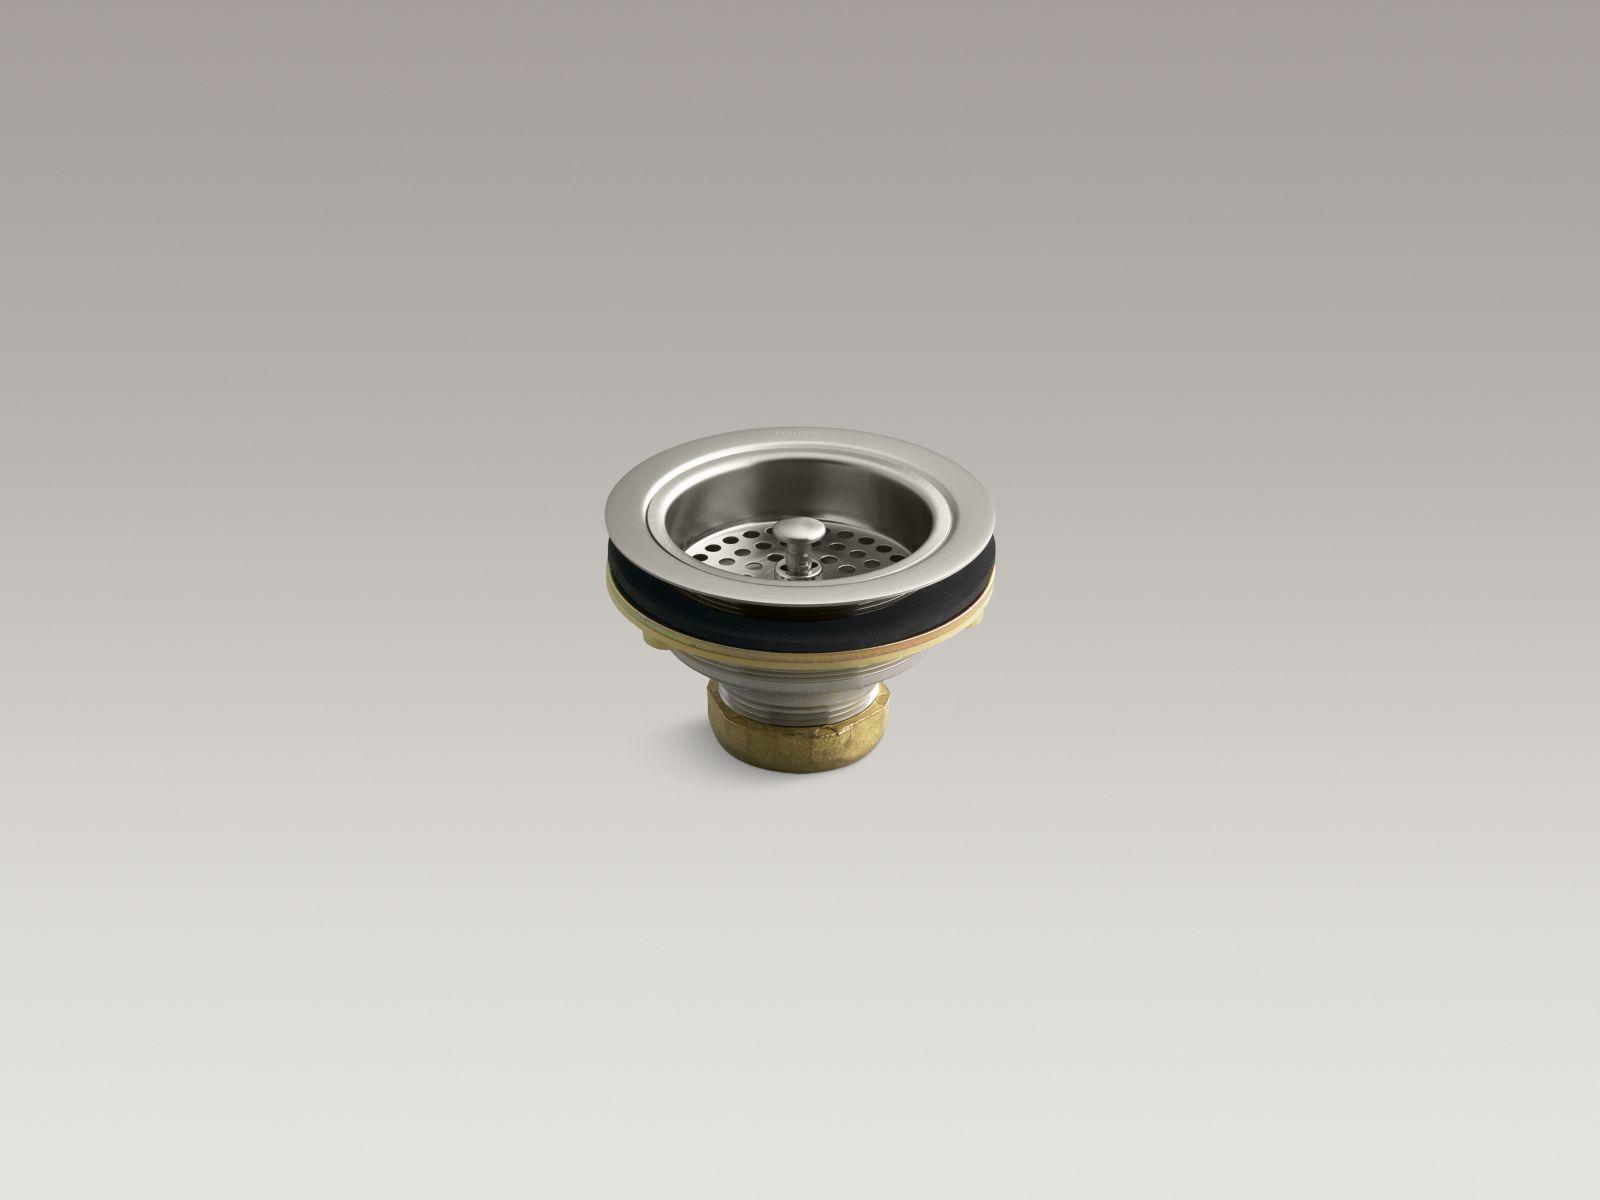 Kohler K-8799-BN Sink Strainer - Less Tail Piece, Brushed Nickel